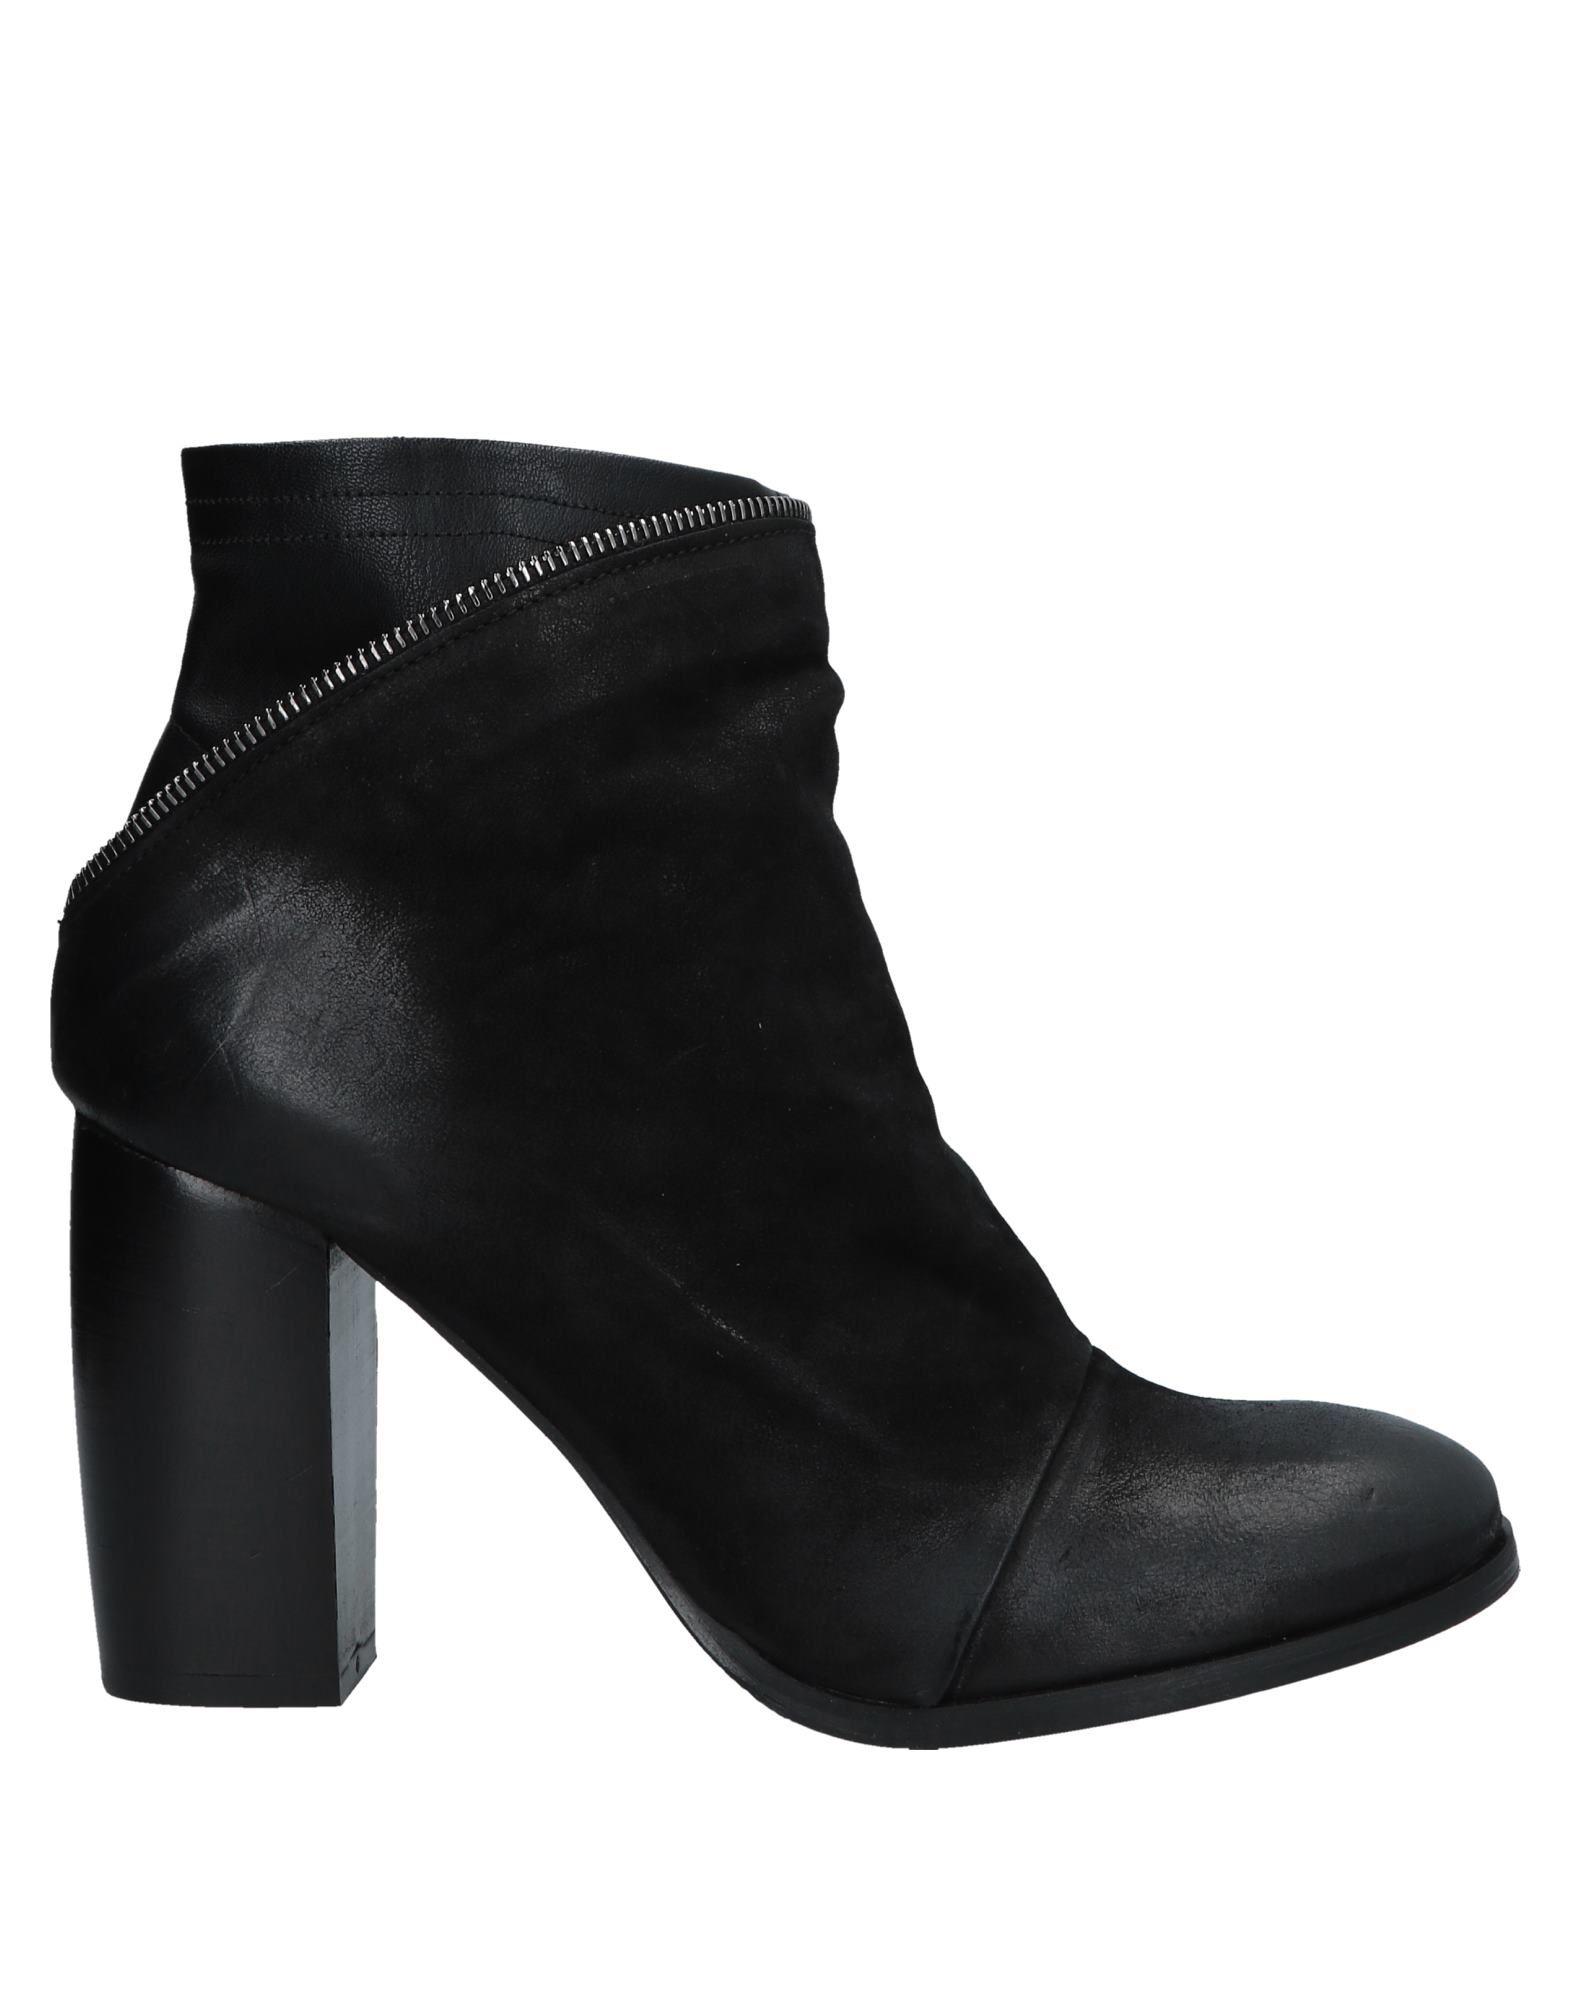 Salvador Ribes Stiefelette Damen 11556557VD Gute Qualität beliebte Schuhe